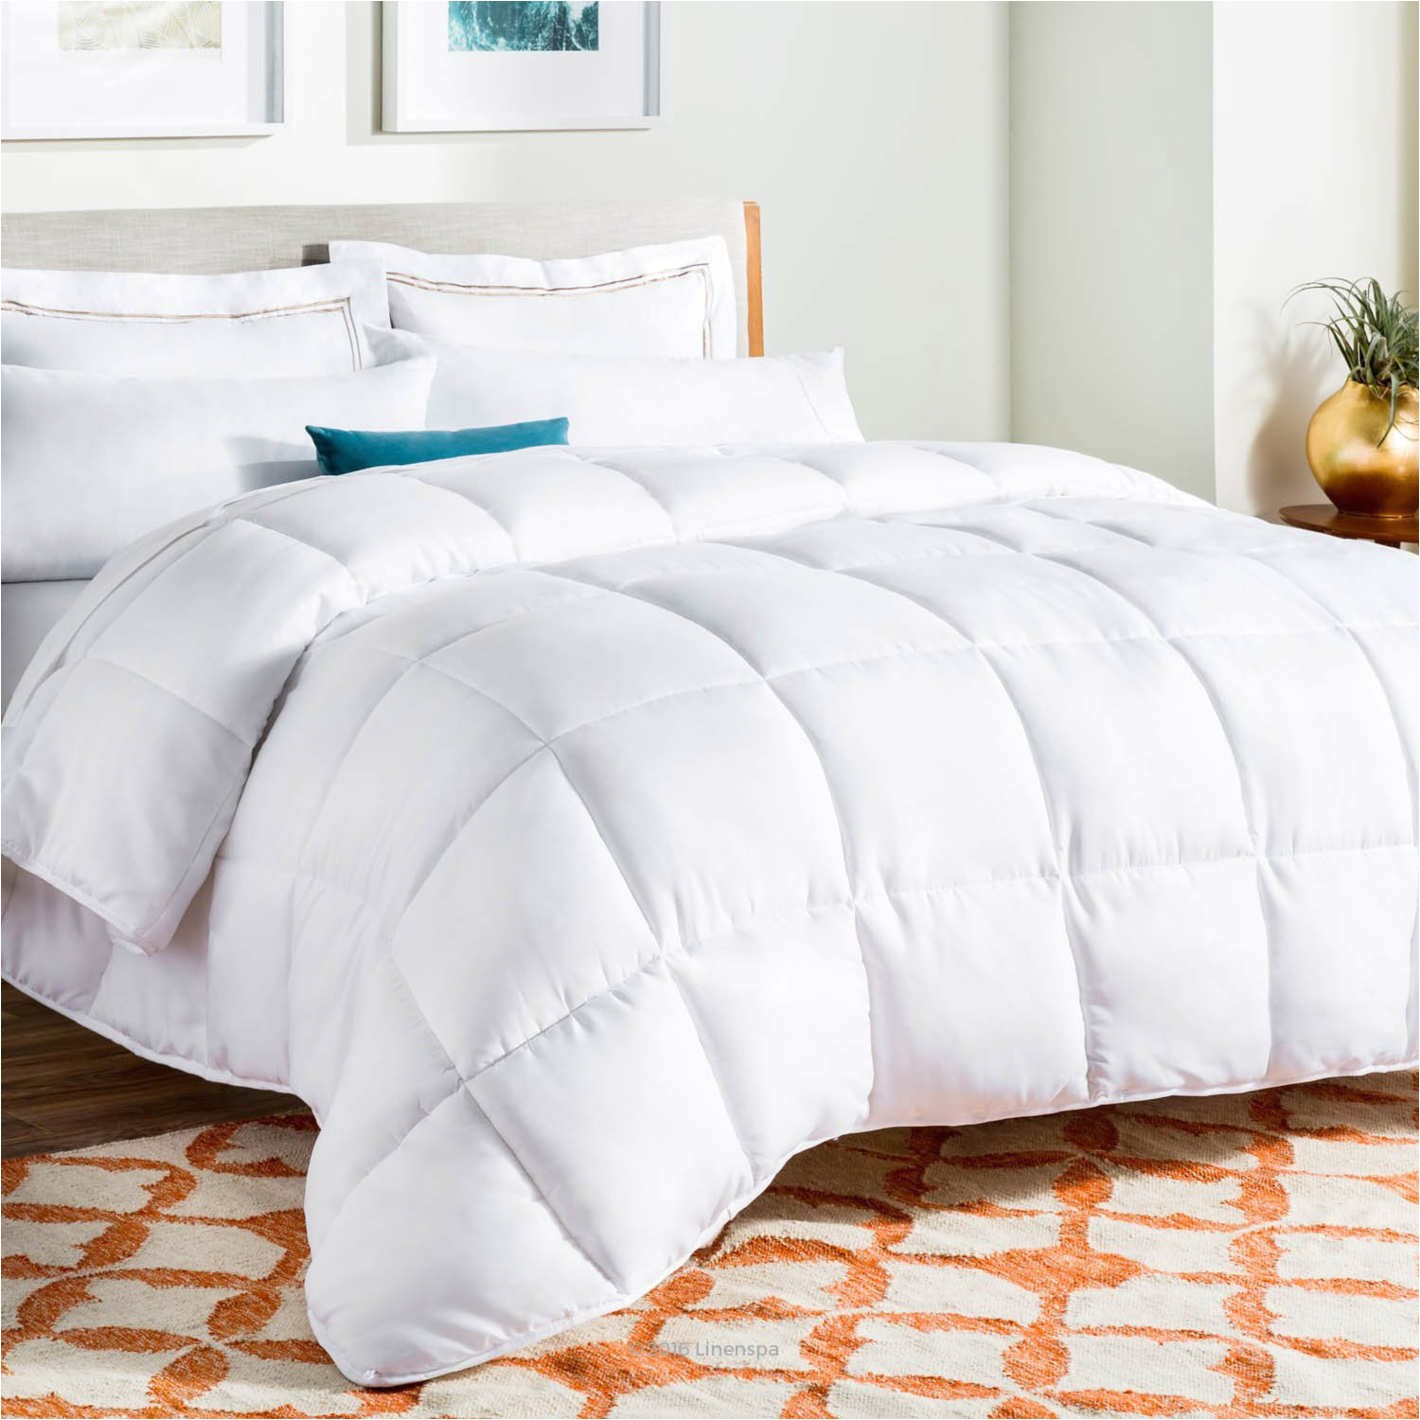 best comforters on amazon